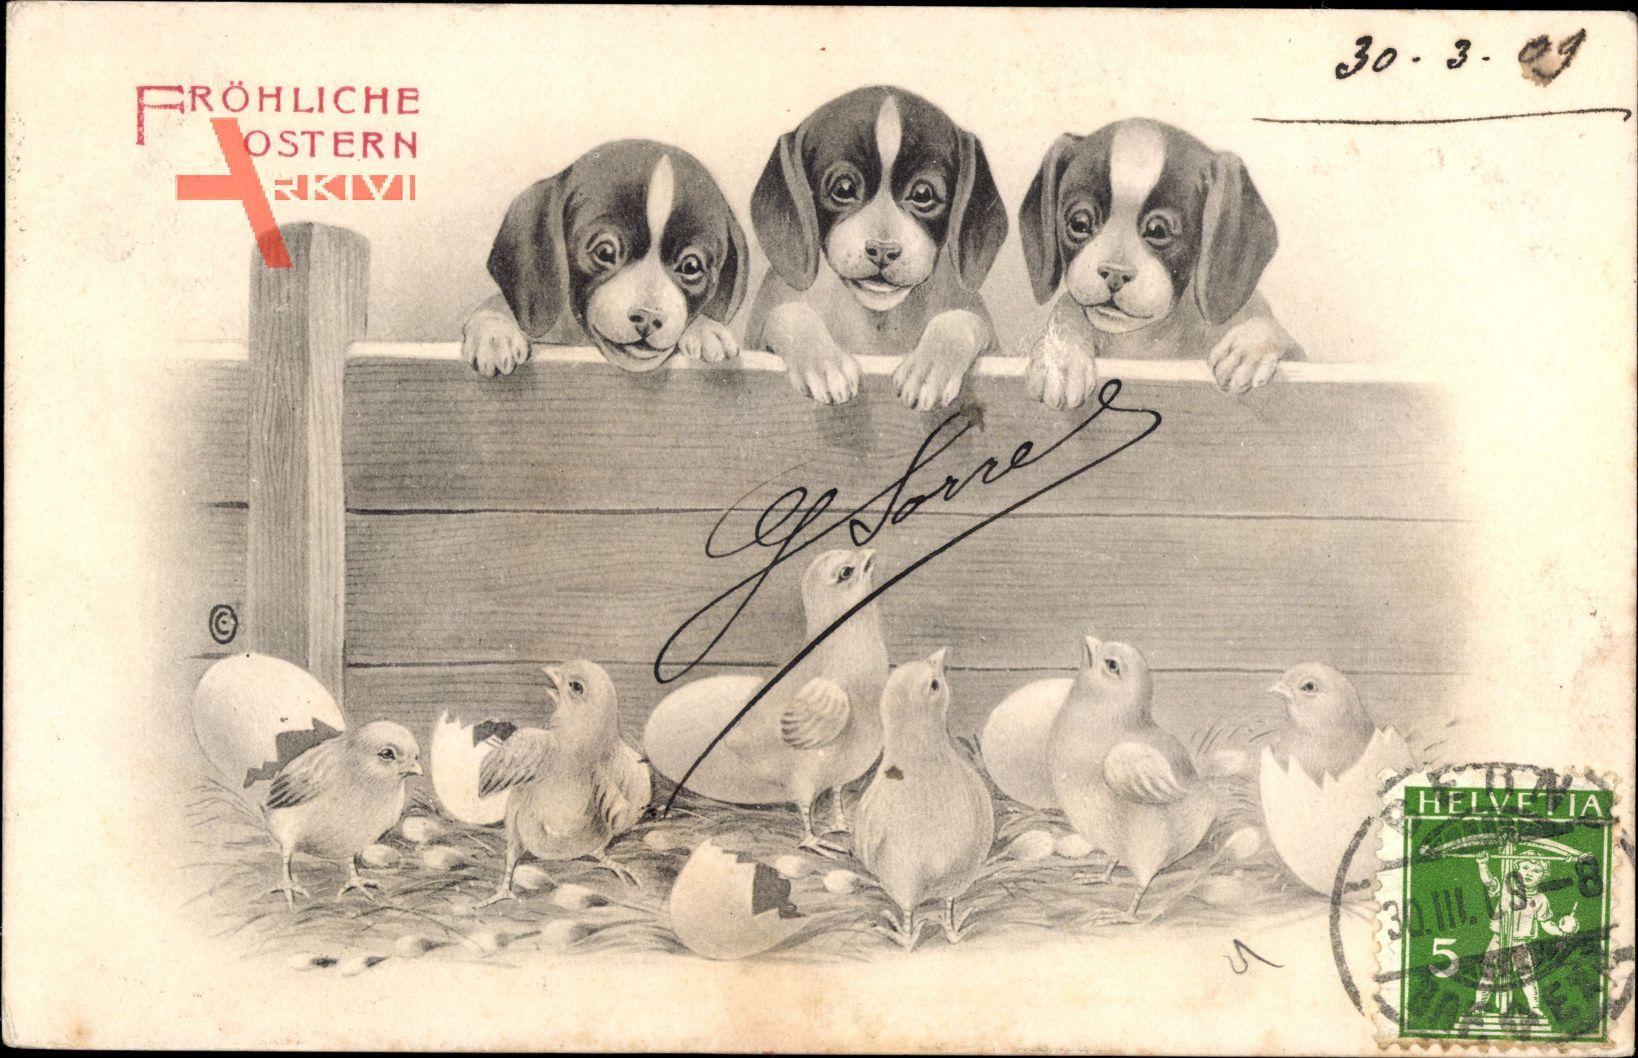 Glückwunsch Ostern, Geschlüpfte Küken, Hundewelpen